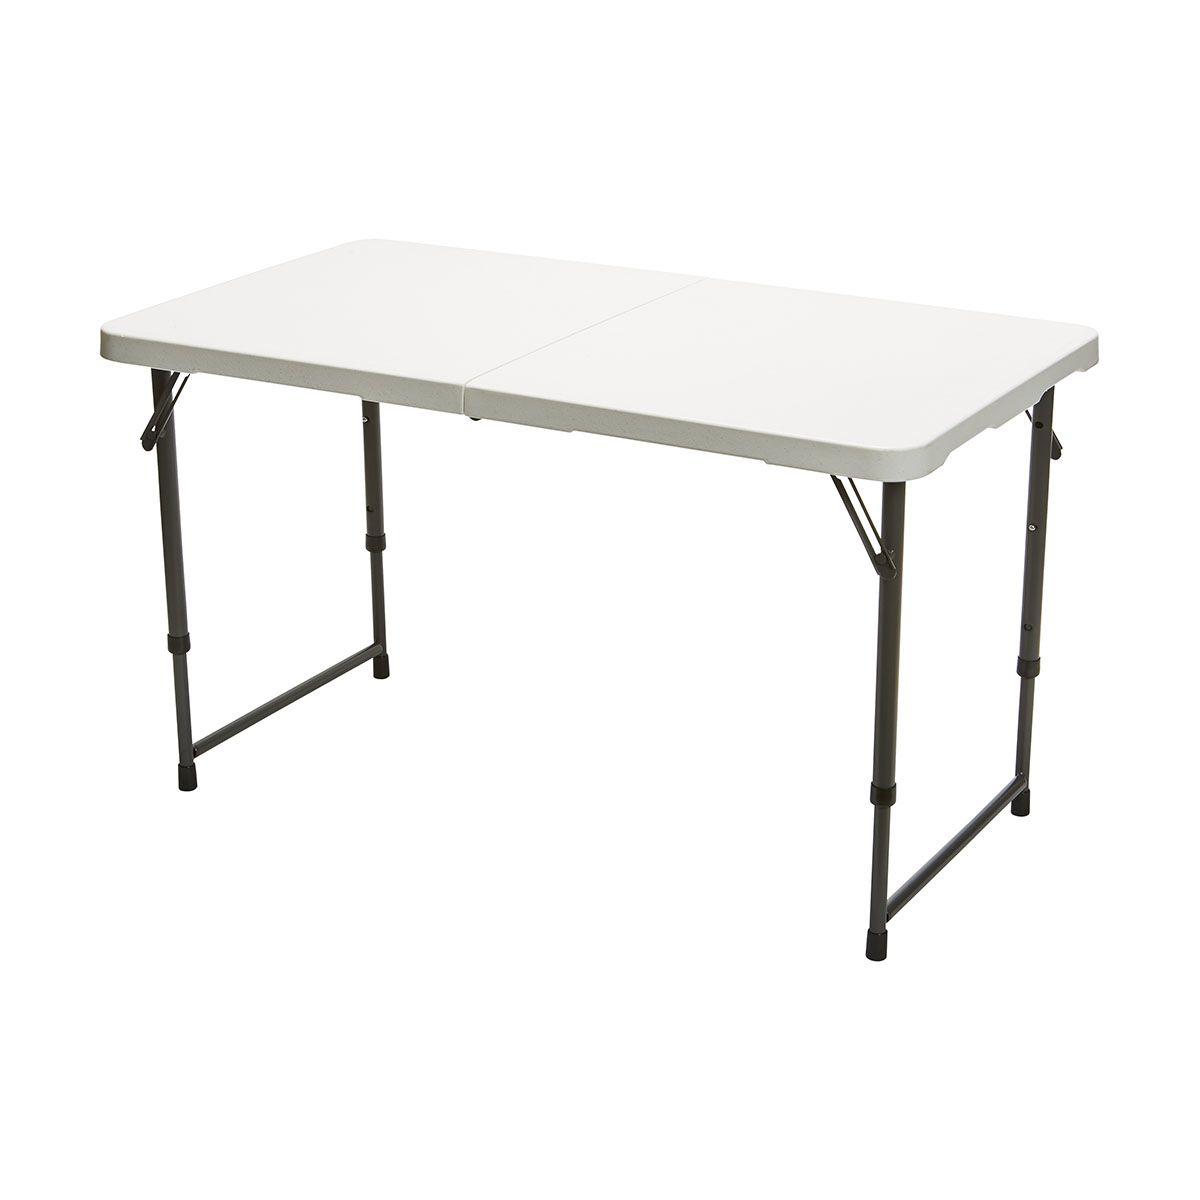 Adjustable Fold In Half Table Kmart Fold In Half Table Half Table Coffee Table To Dining Table